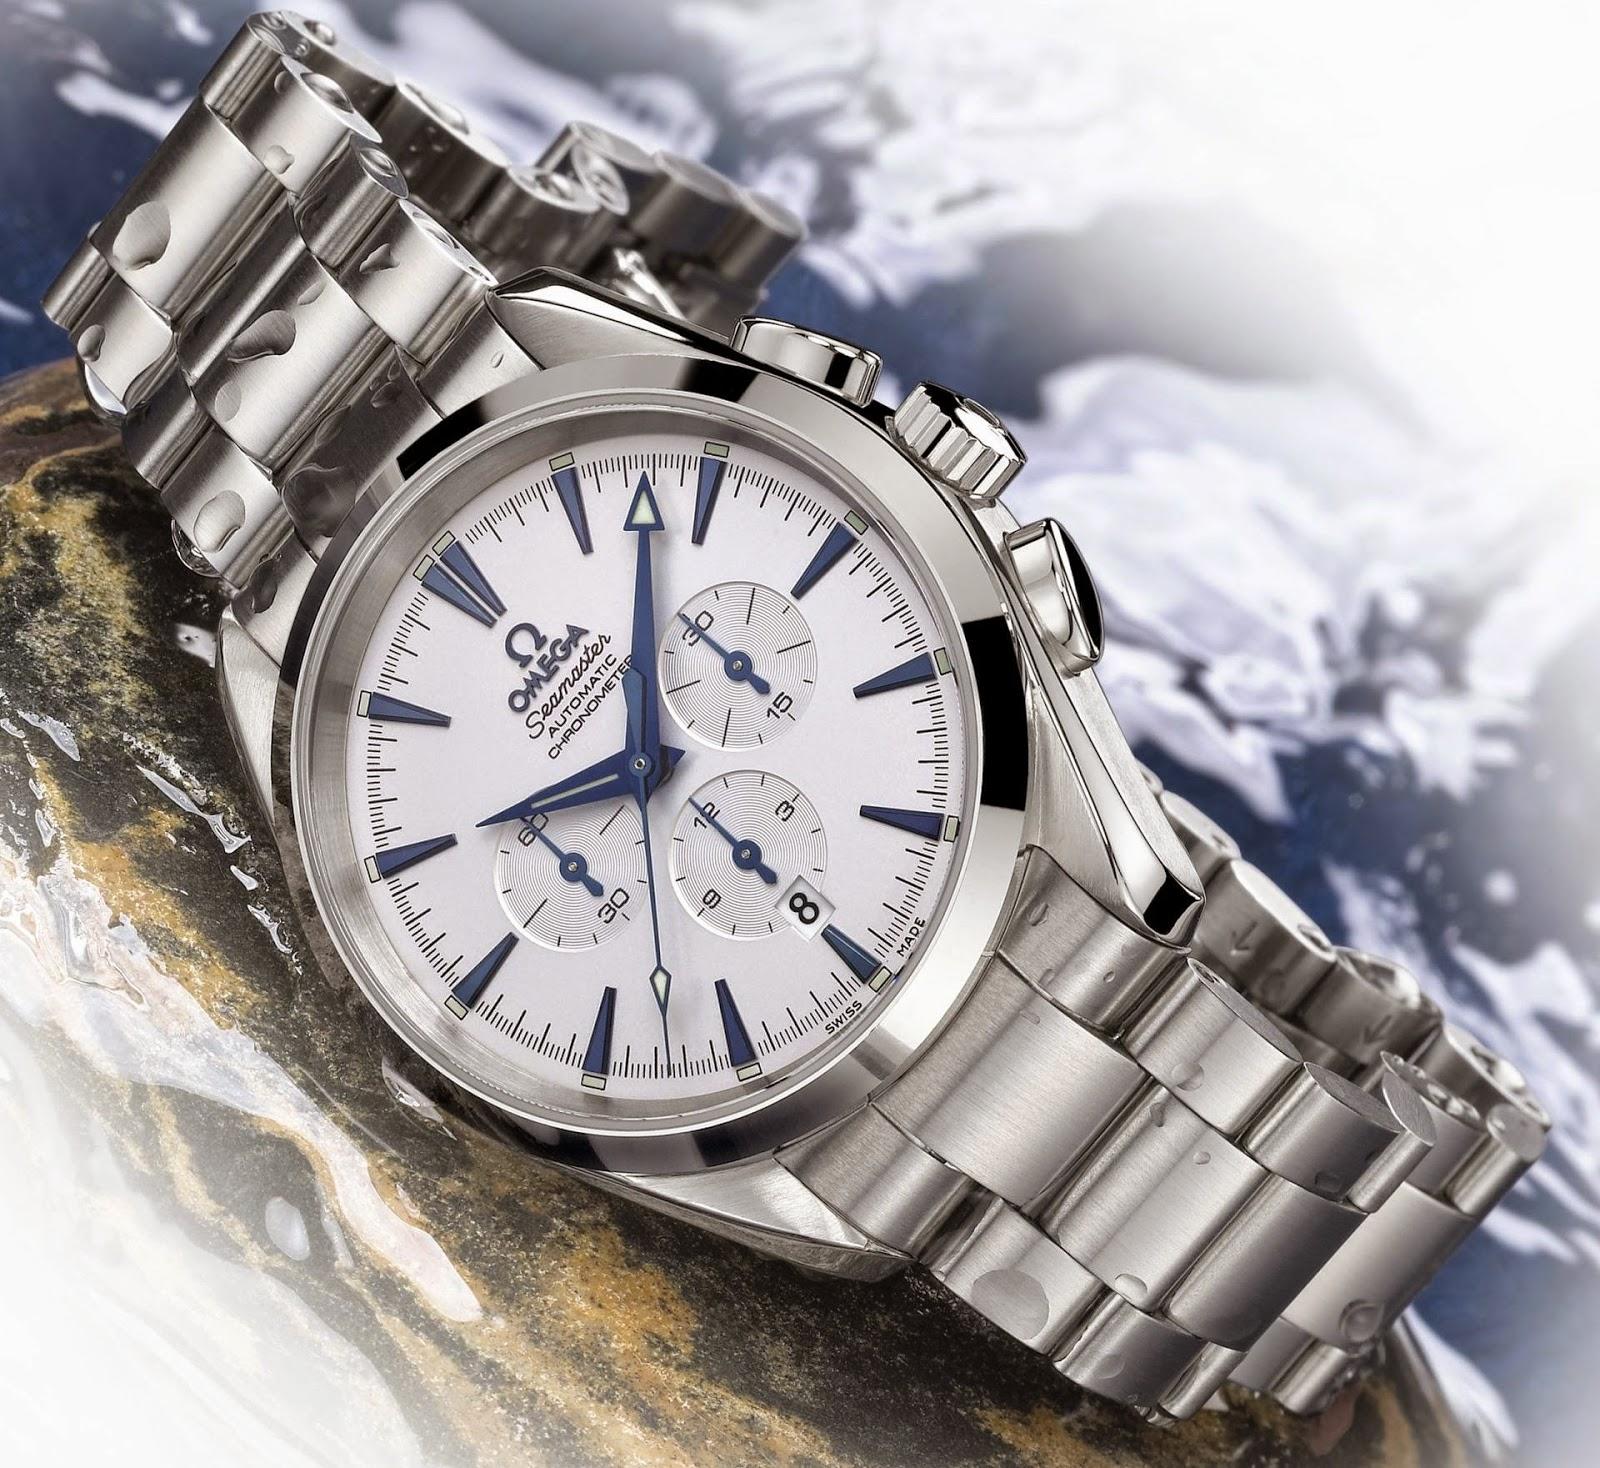 Omega Seamaster Aqua Terra Chronograph watch replica